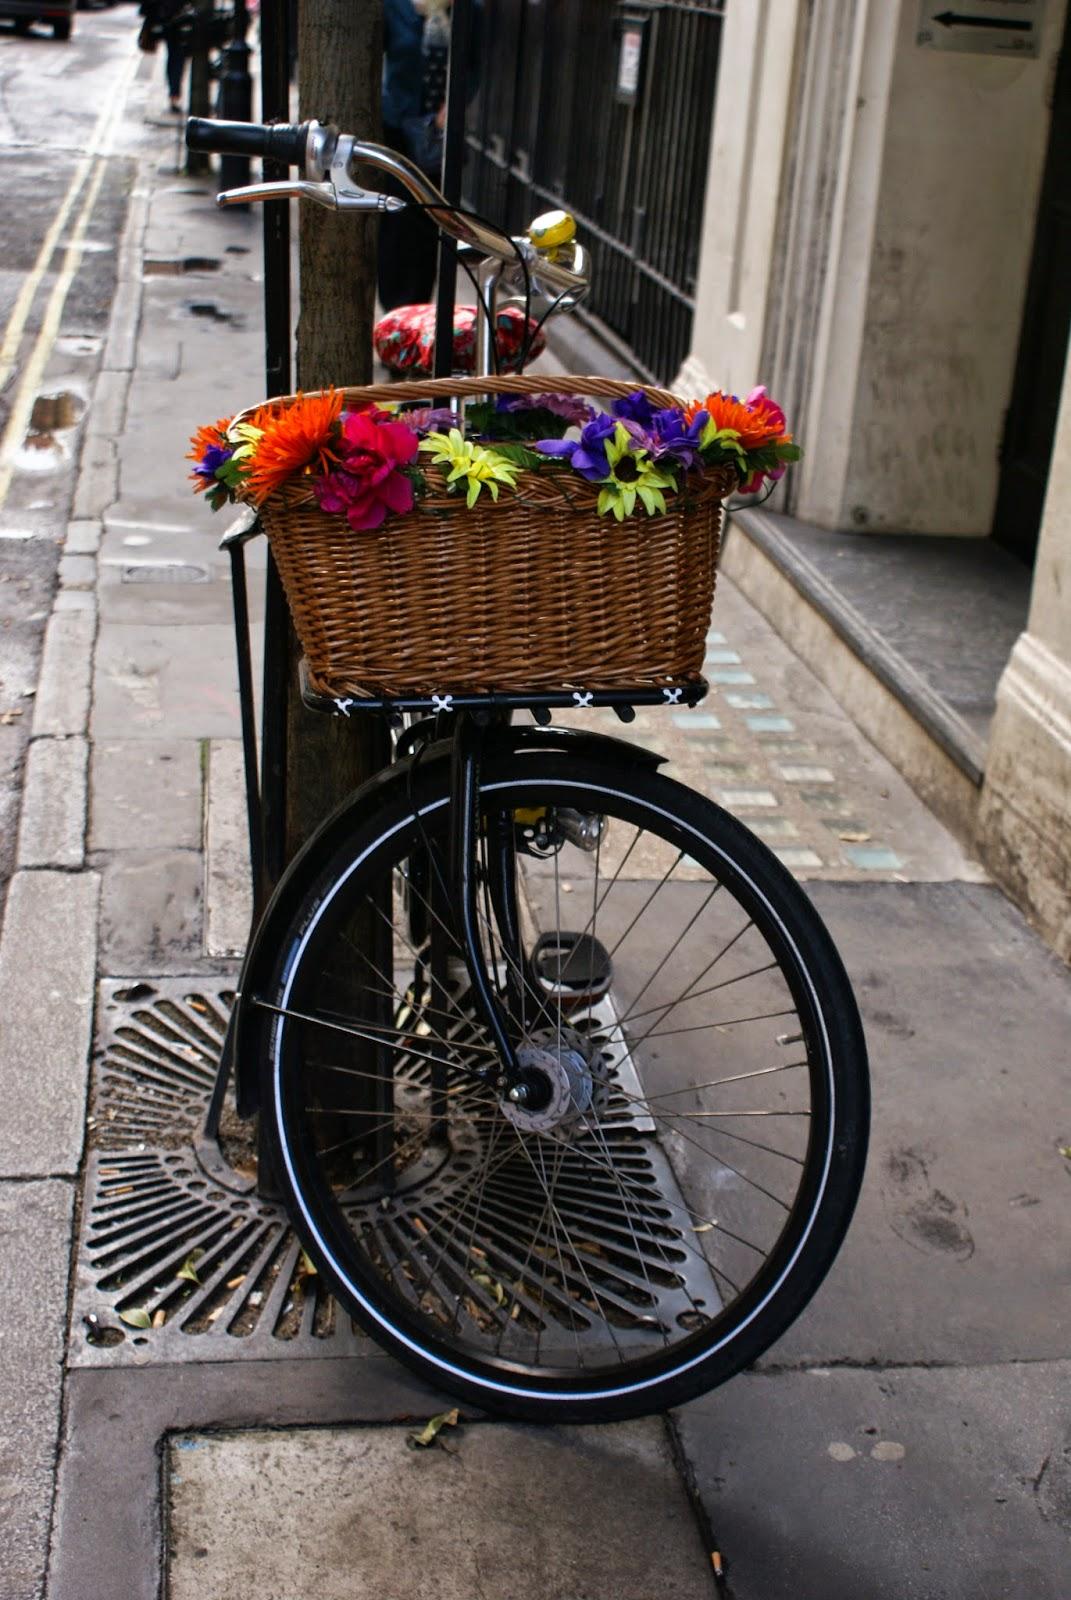 bike flowers soho london uk england britain